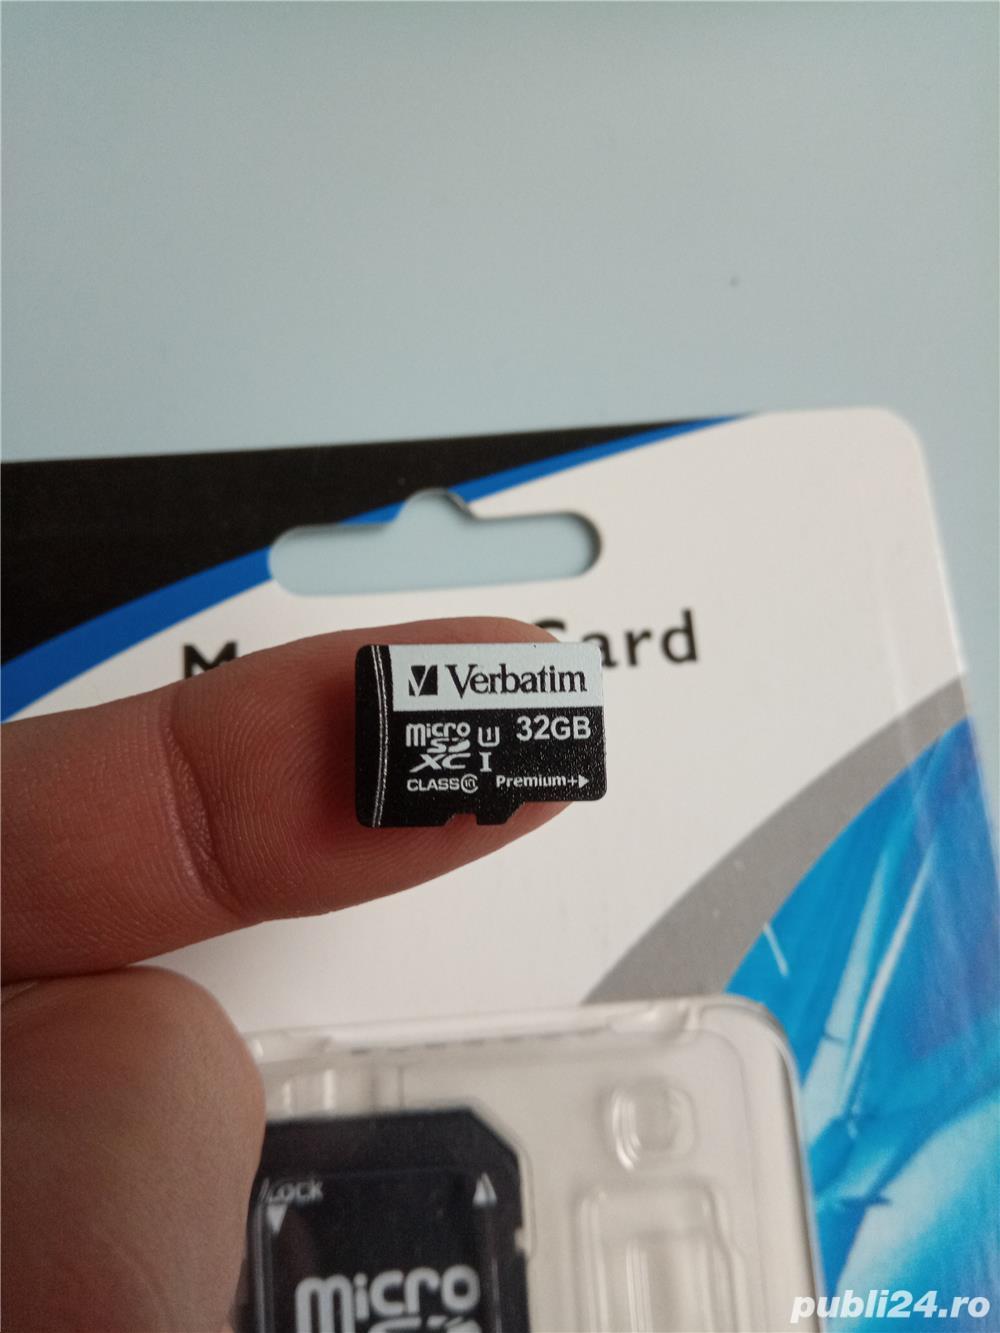 Micro sd Verbatim 32Gb (class 10 premium +)+adaptor+cititor card usb2.0